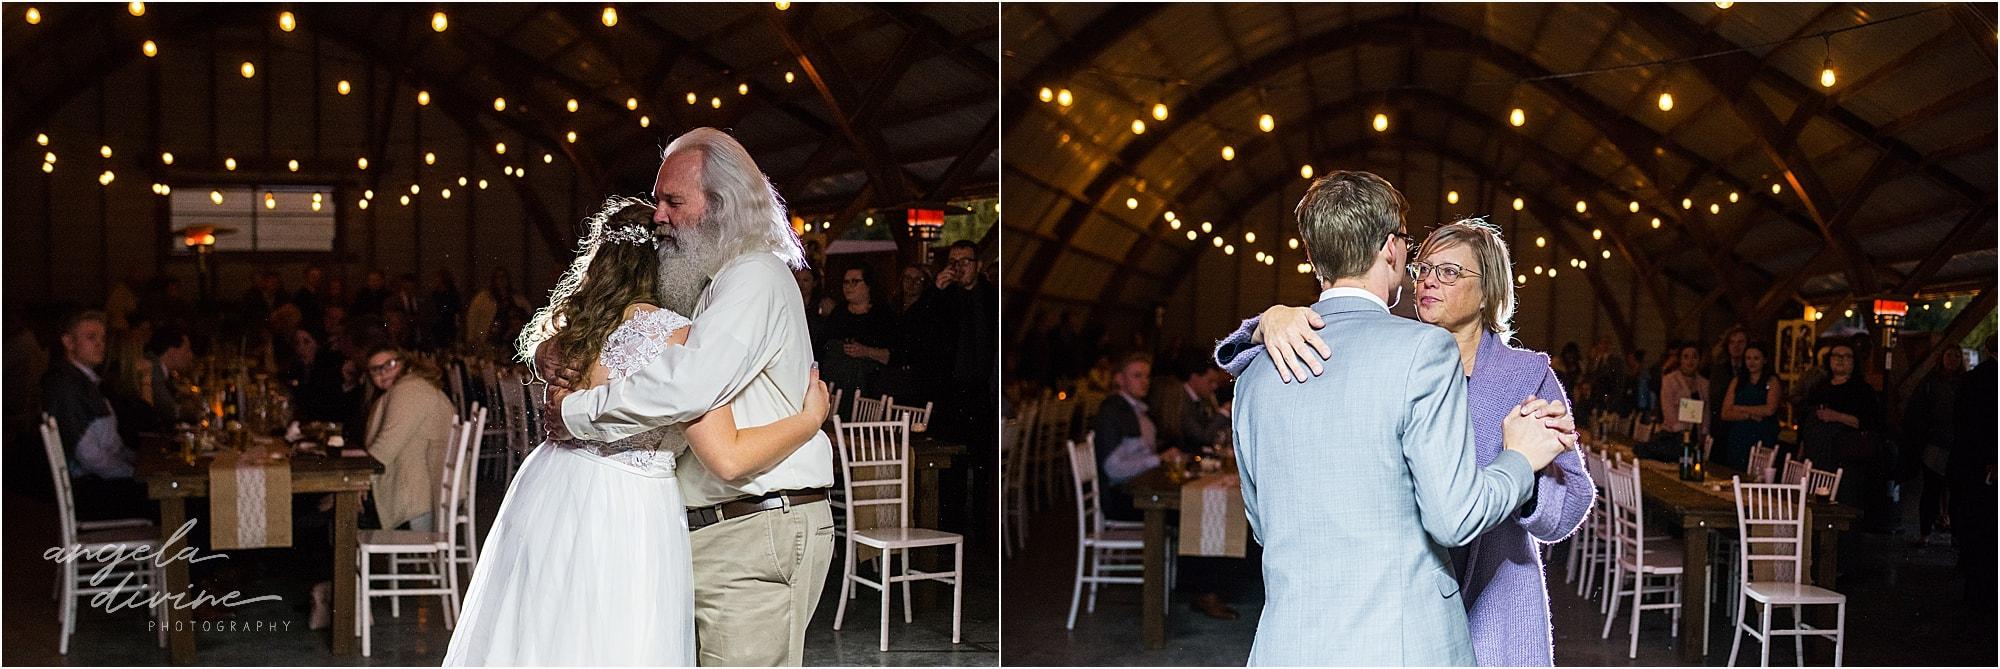 The Cottage Farmhouse Wedding Formal dances